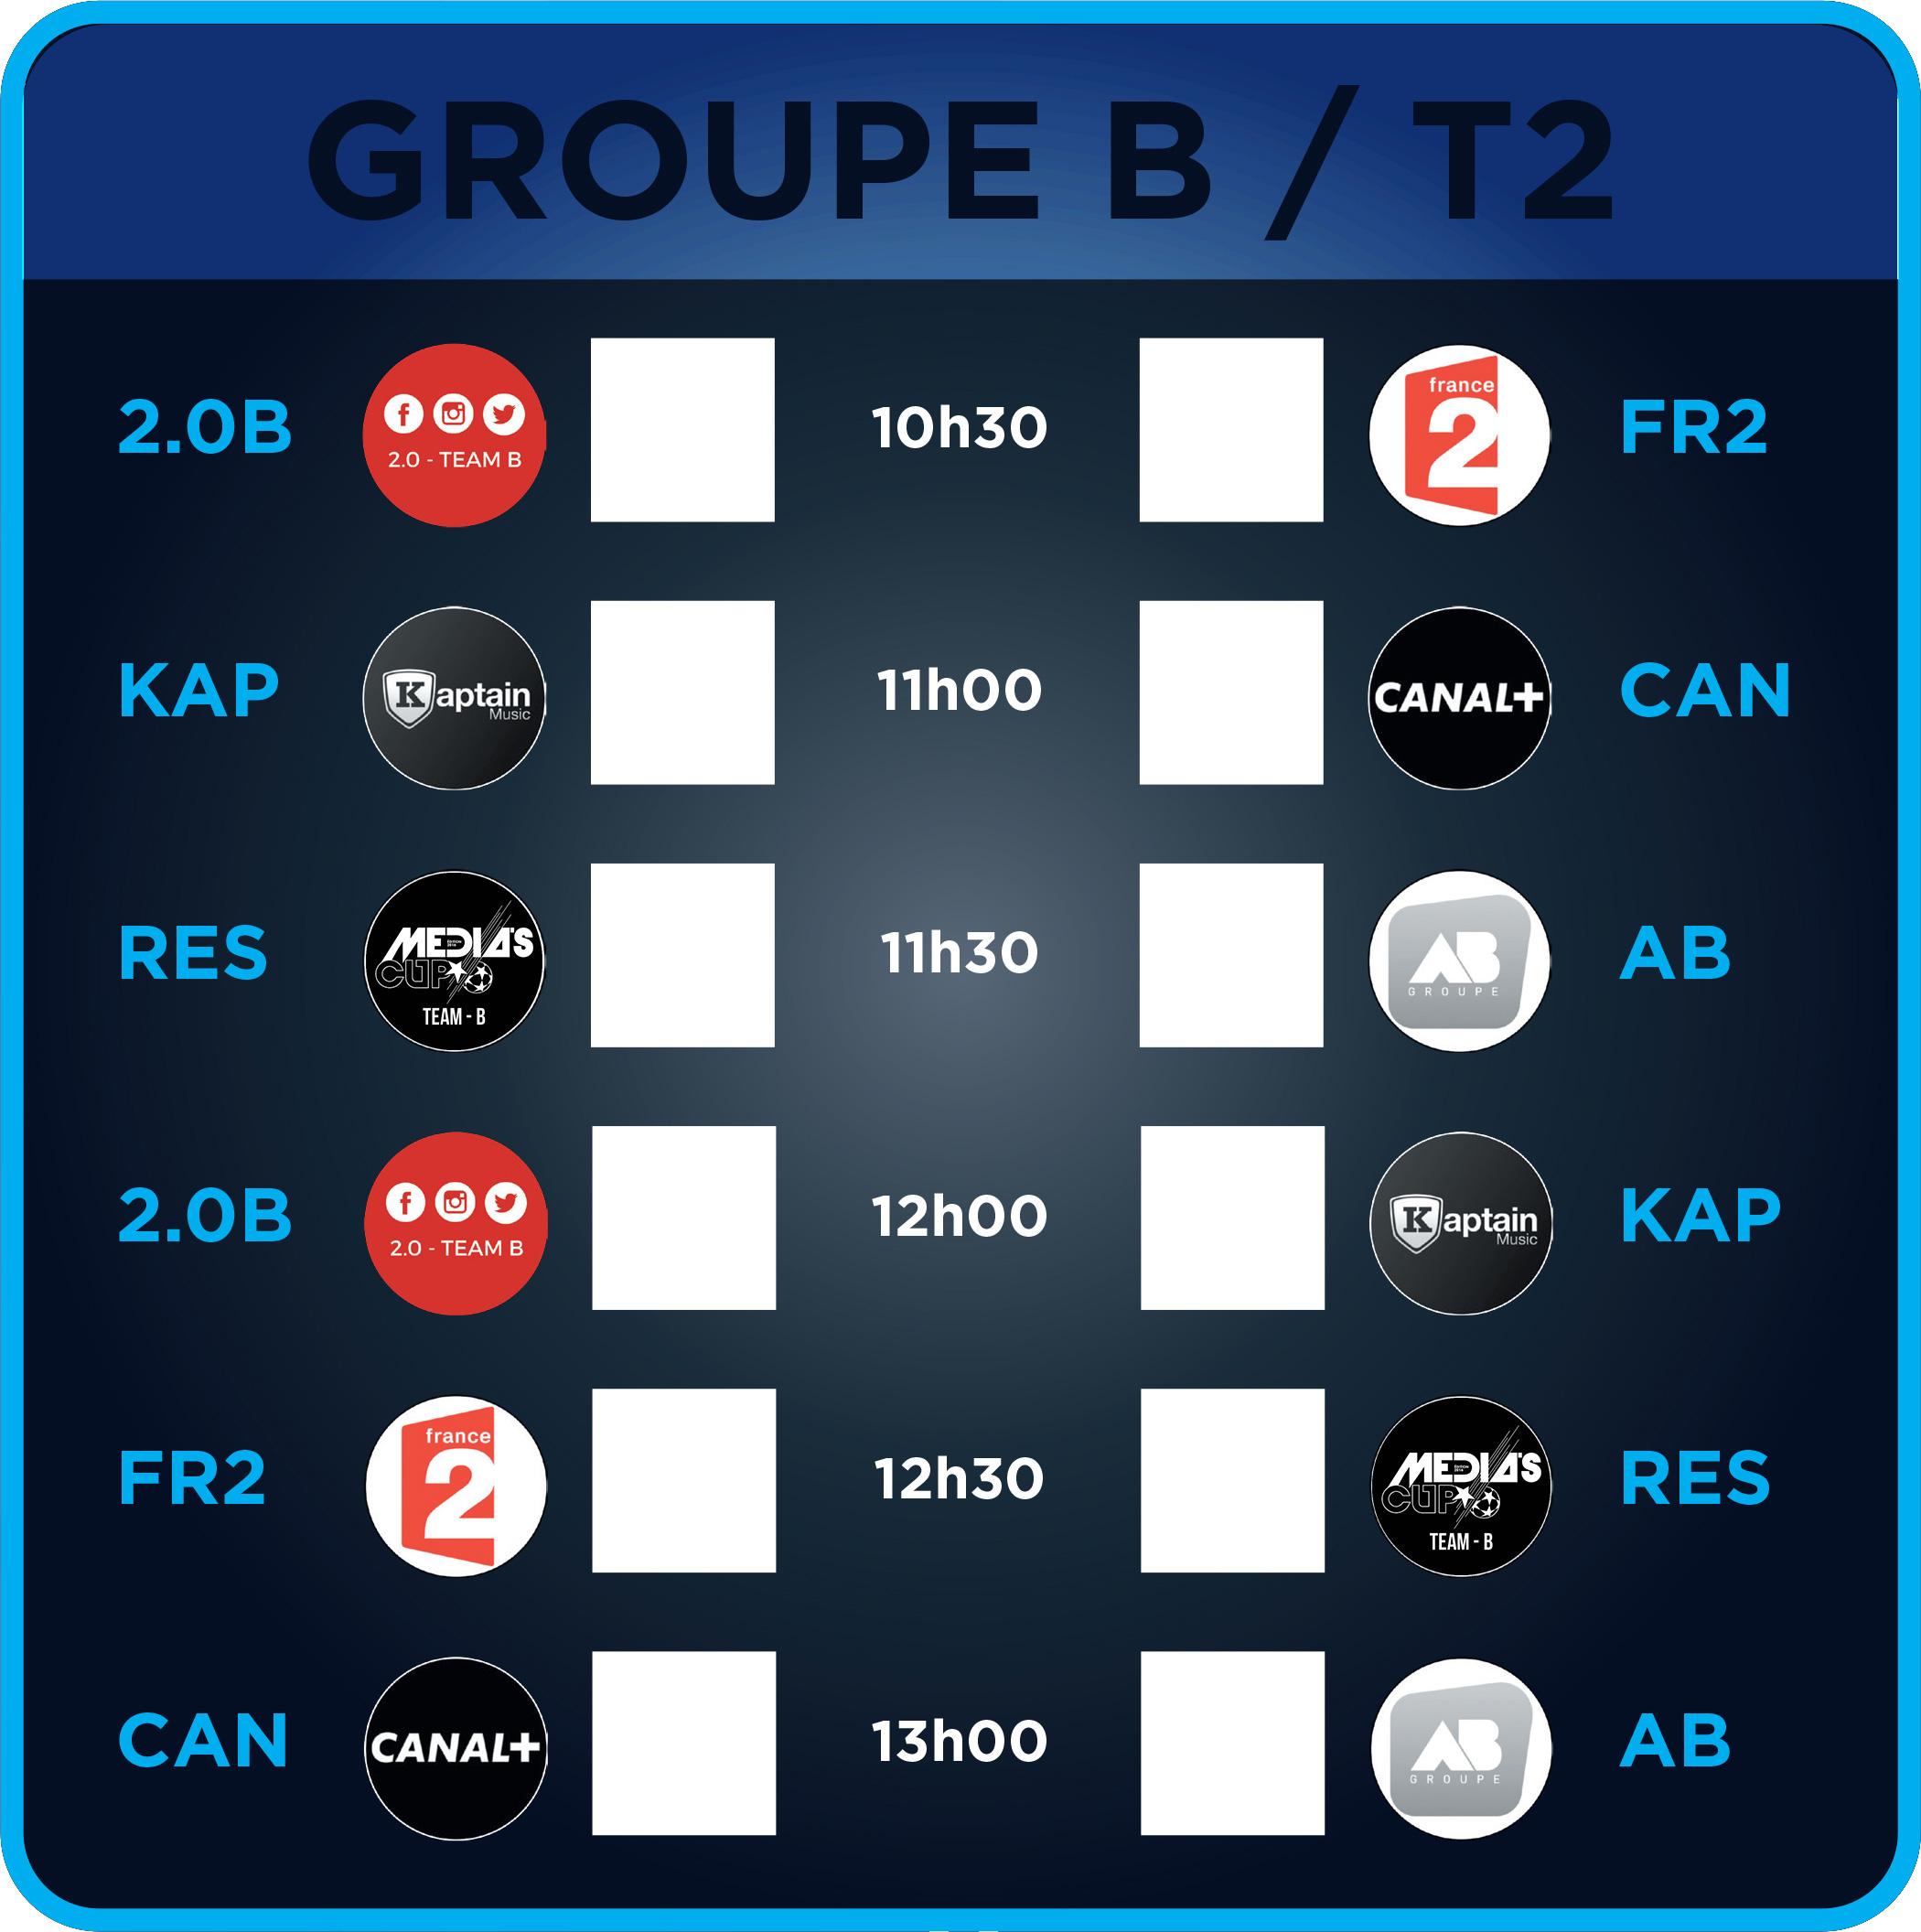 Groupe B - Terrain 2